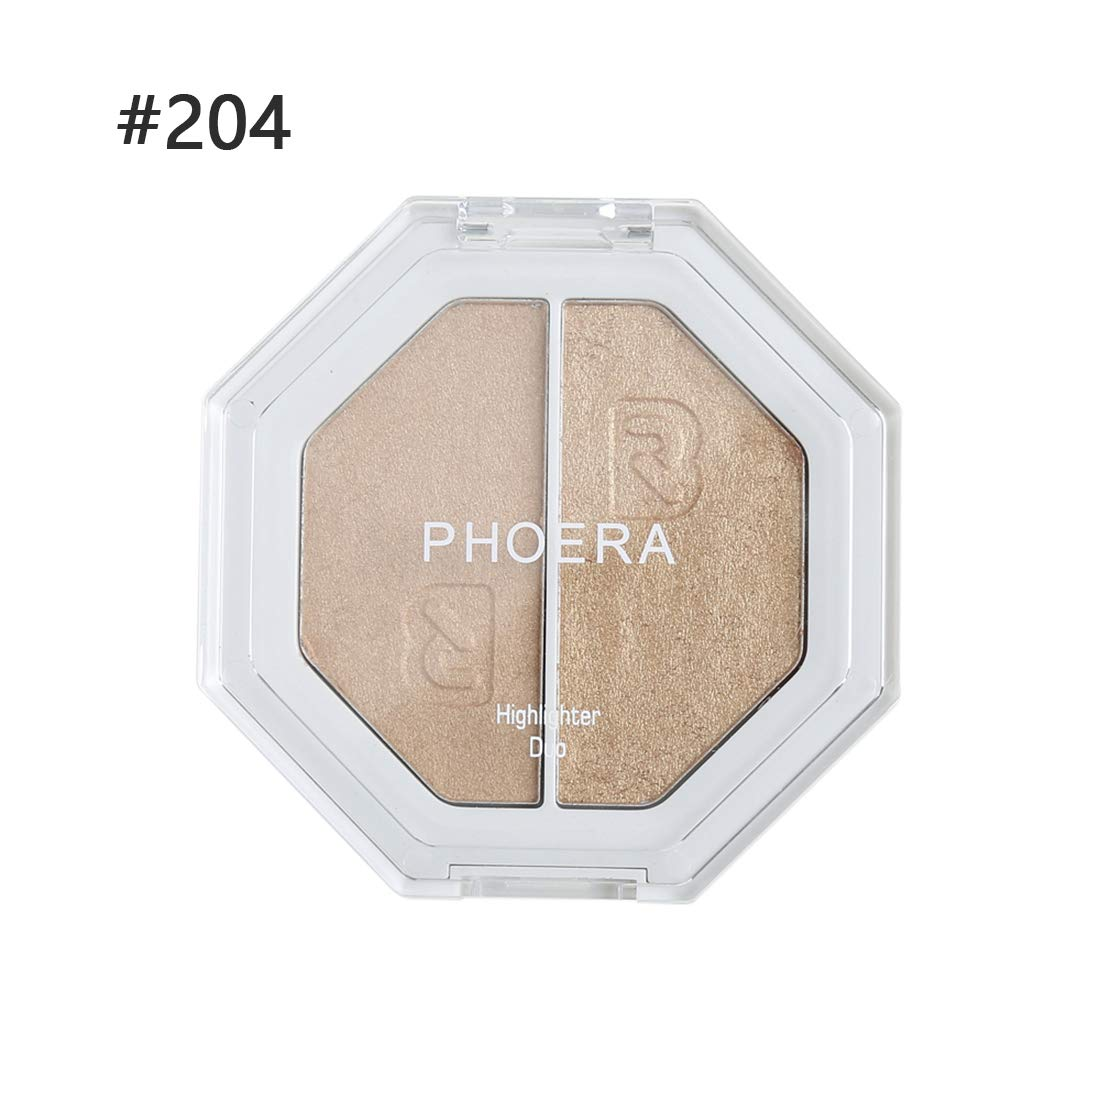 Msliy Highlighter Cream 2 Colors Highlight Gloss Powder Concealer Brighten Skin Lasting Eyeshadow Pigment Palette Makeup Tools